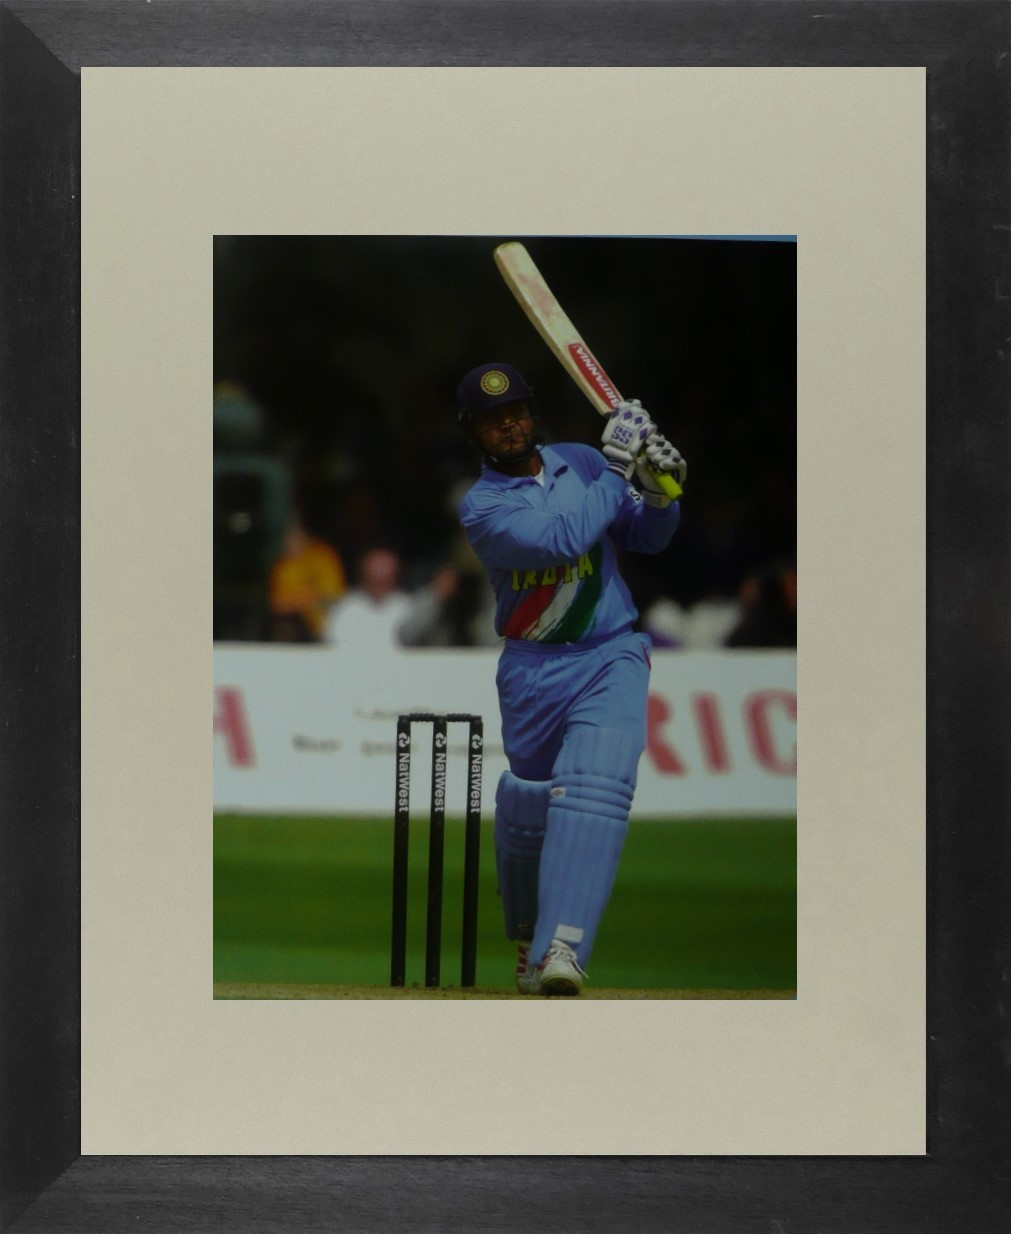 Virender Sehwag (Cricket) - Framed Picture 11 x 14